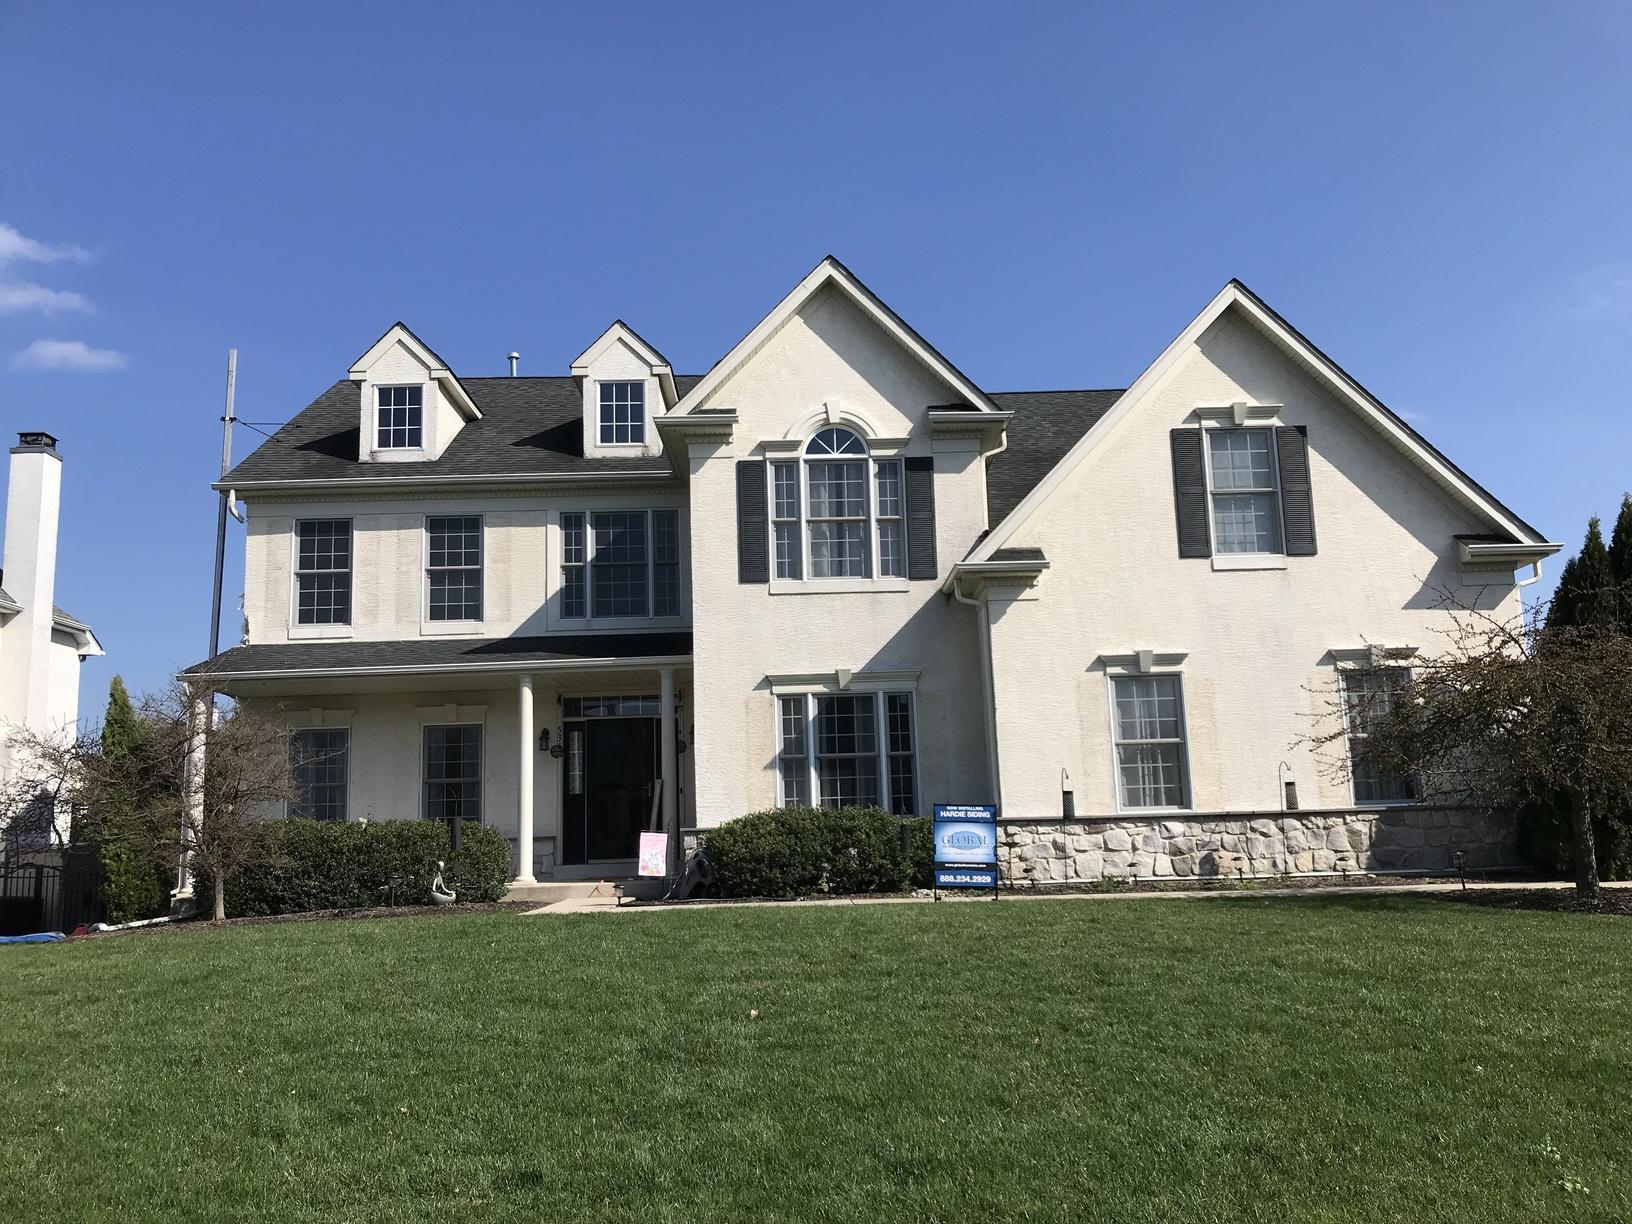 Replacing Stucco Siding on Home in Warrington, PA